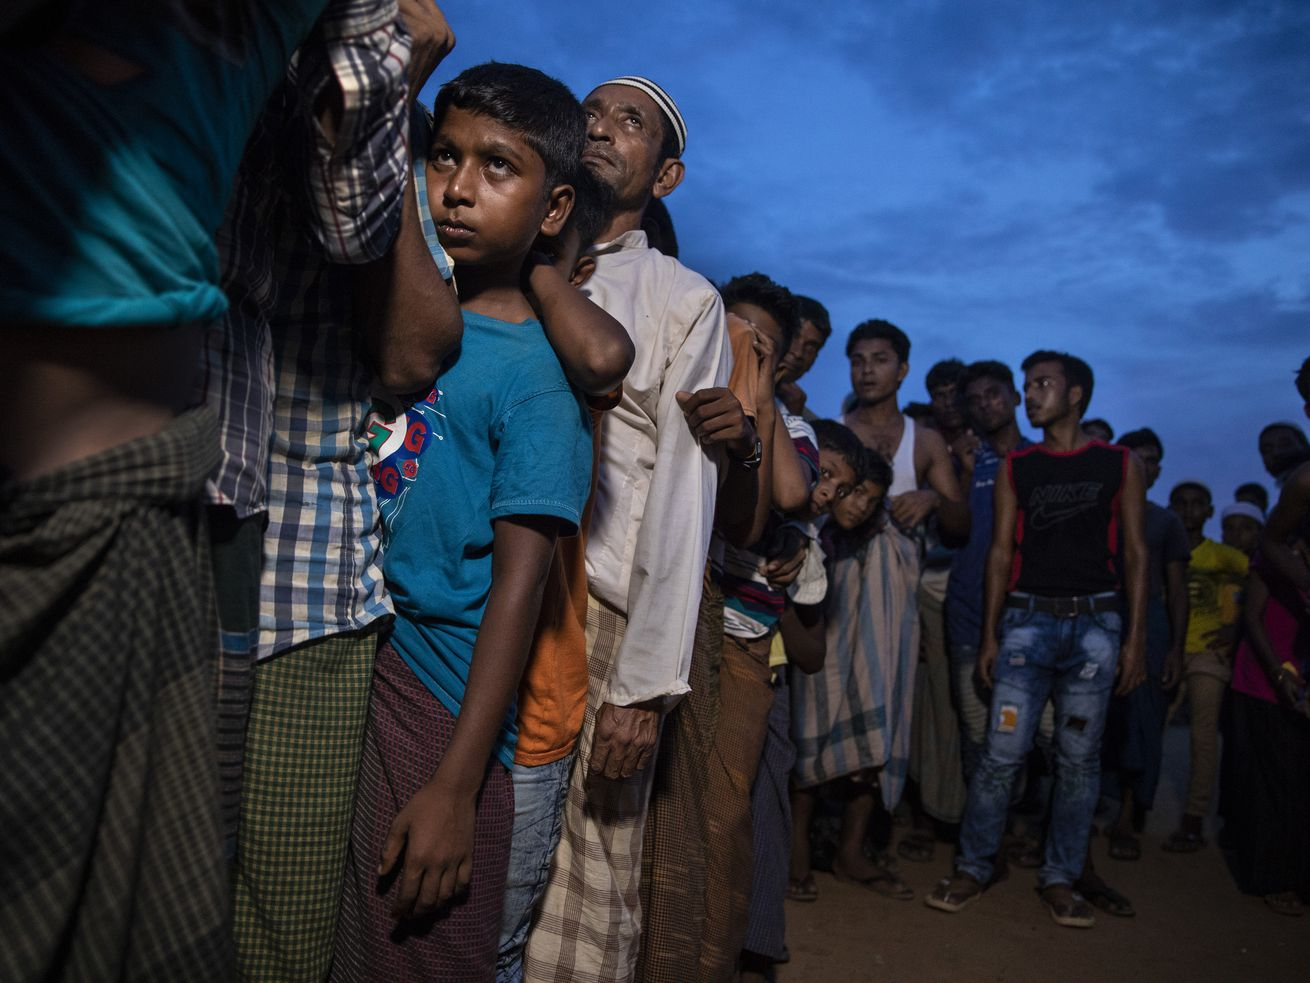 Rohingya refugees wait in Cox's Bazar, Bangladesh, in August 2018.